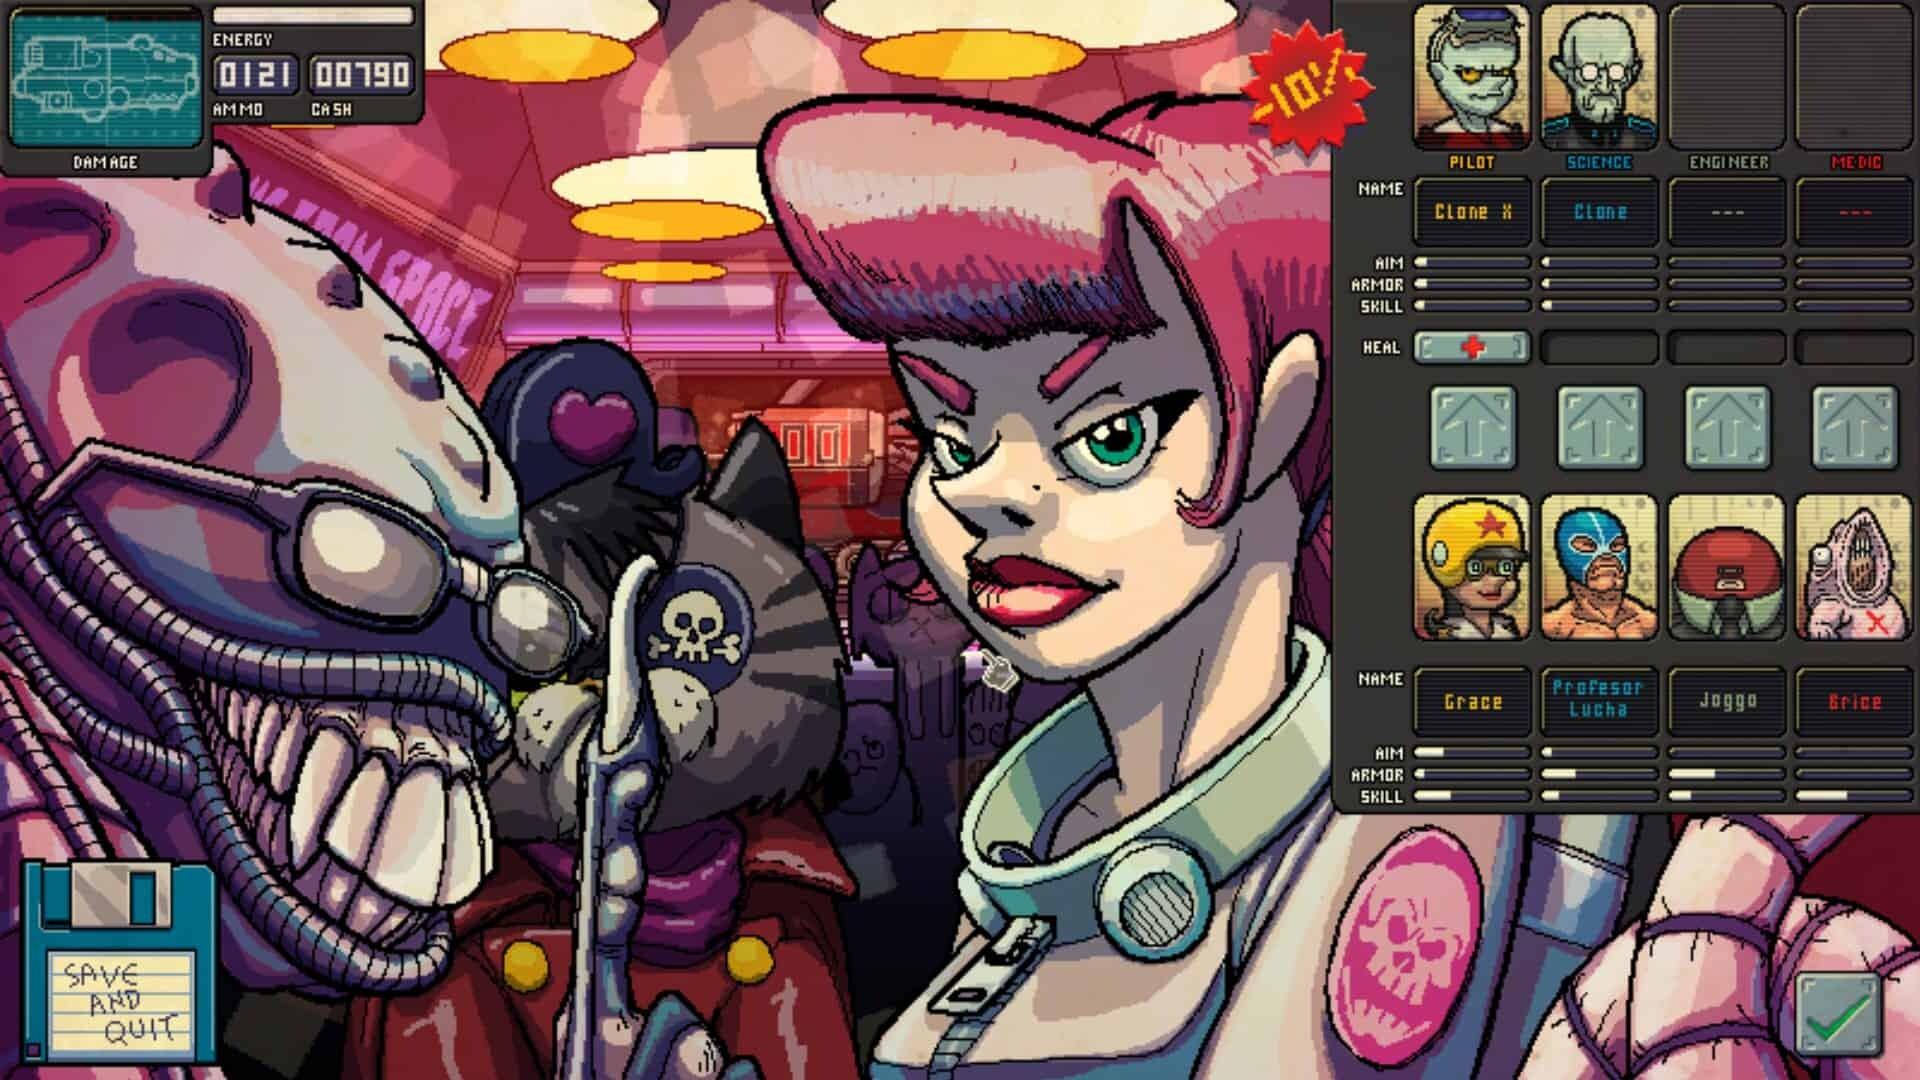 Fission Superstar X game screenshot, hiring crew